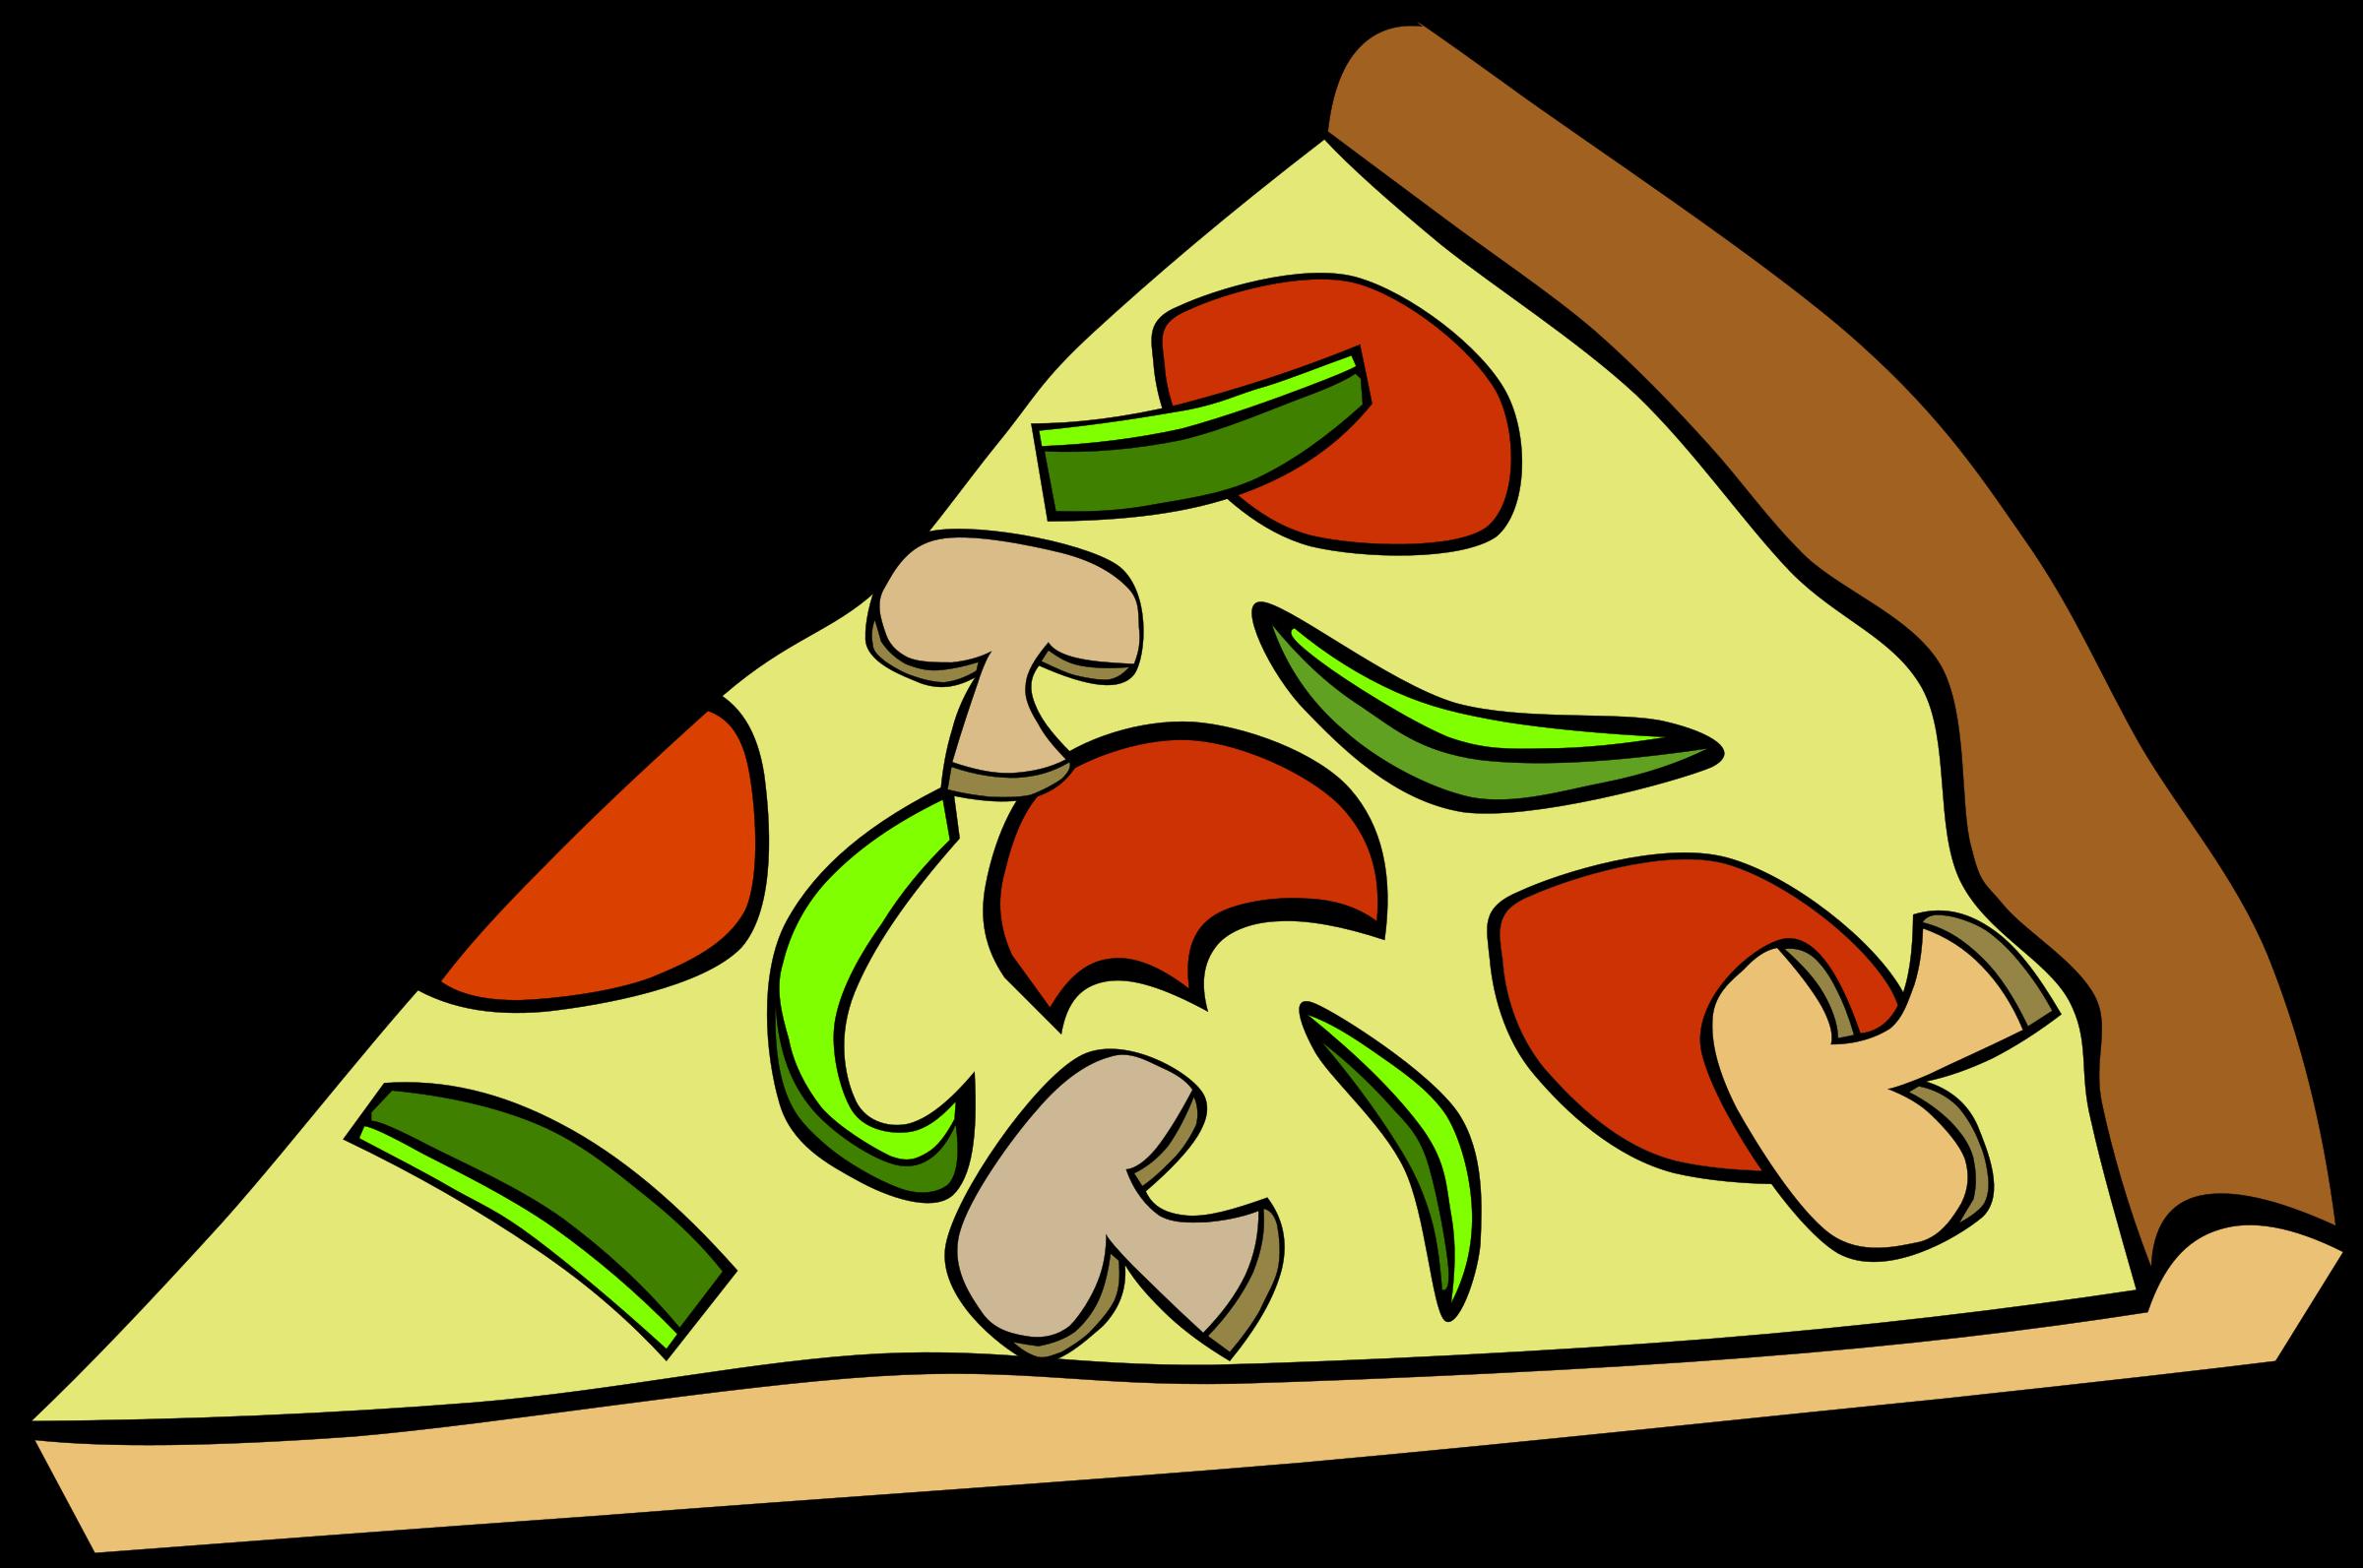 pizza bagel clipart - photo #44